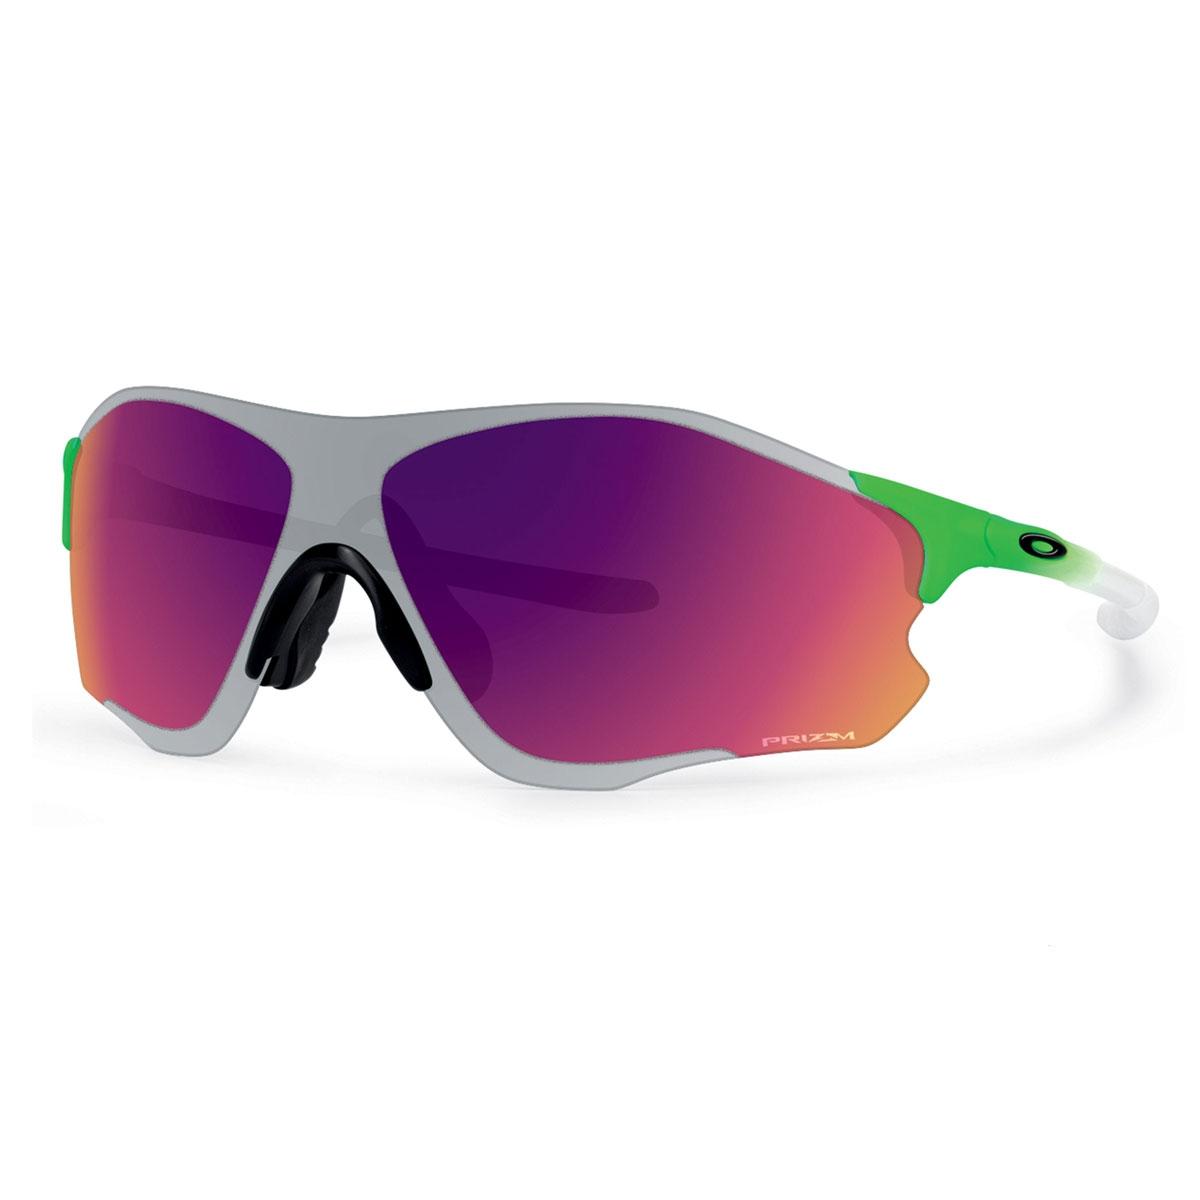 c681085da02 Image of Oakley EVZero Path Prizm Field Chrome Iridium Sunglasses - Green  Fade Frame